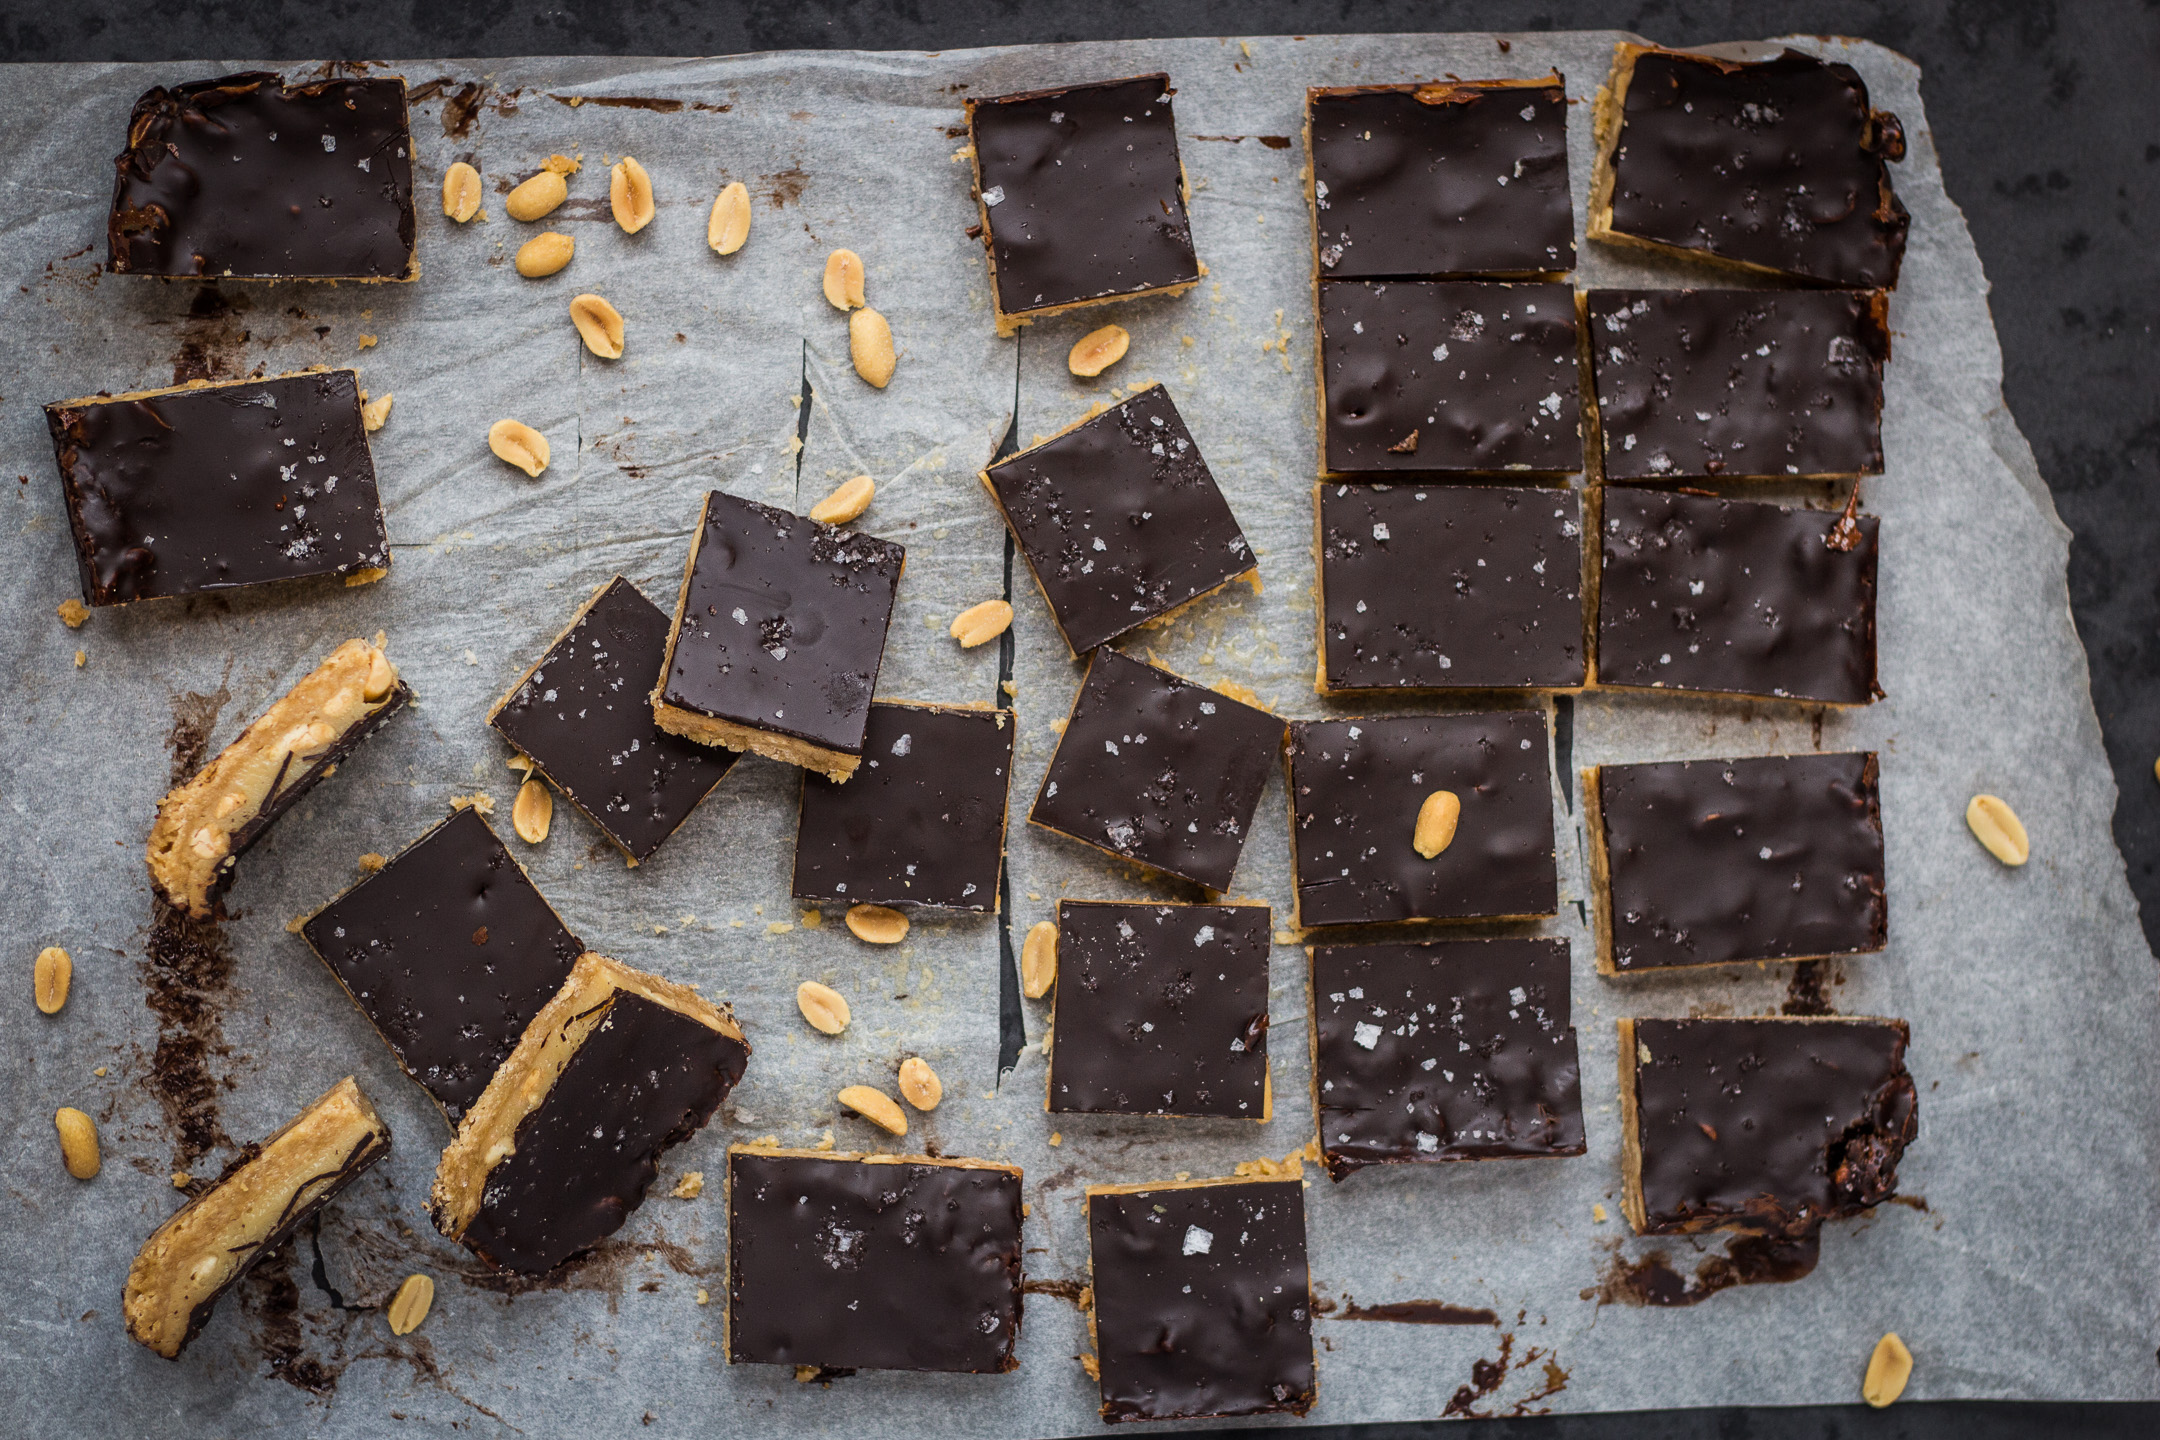 salted-caramel-peanut-slice-gluten-free-recipe-7